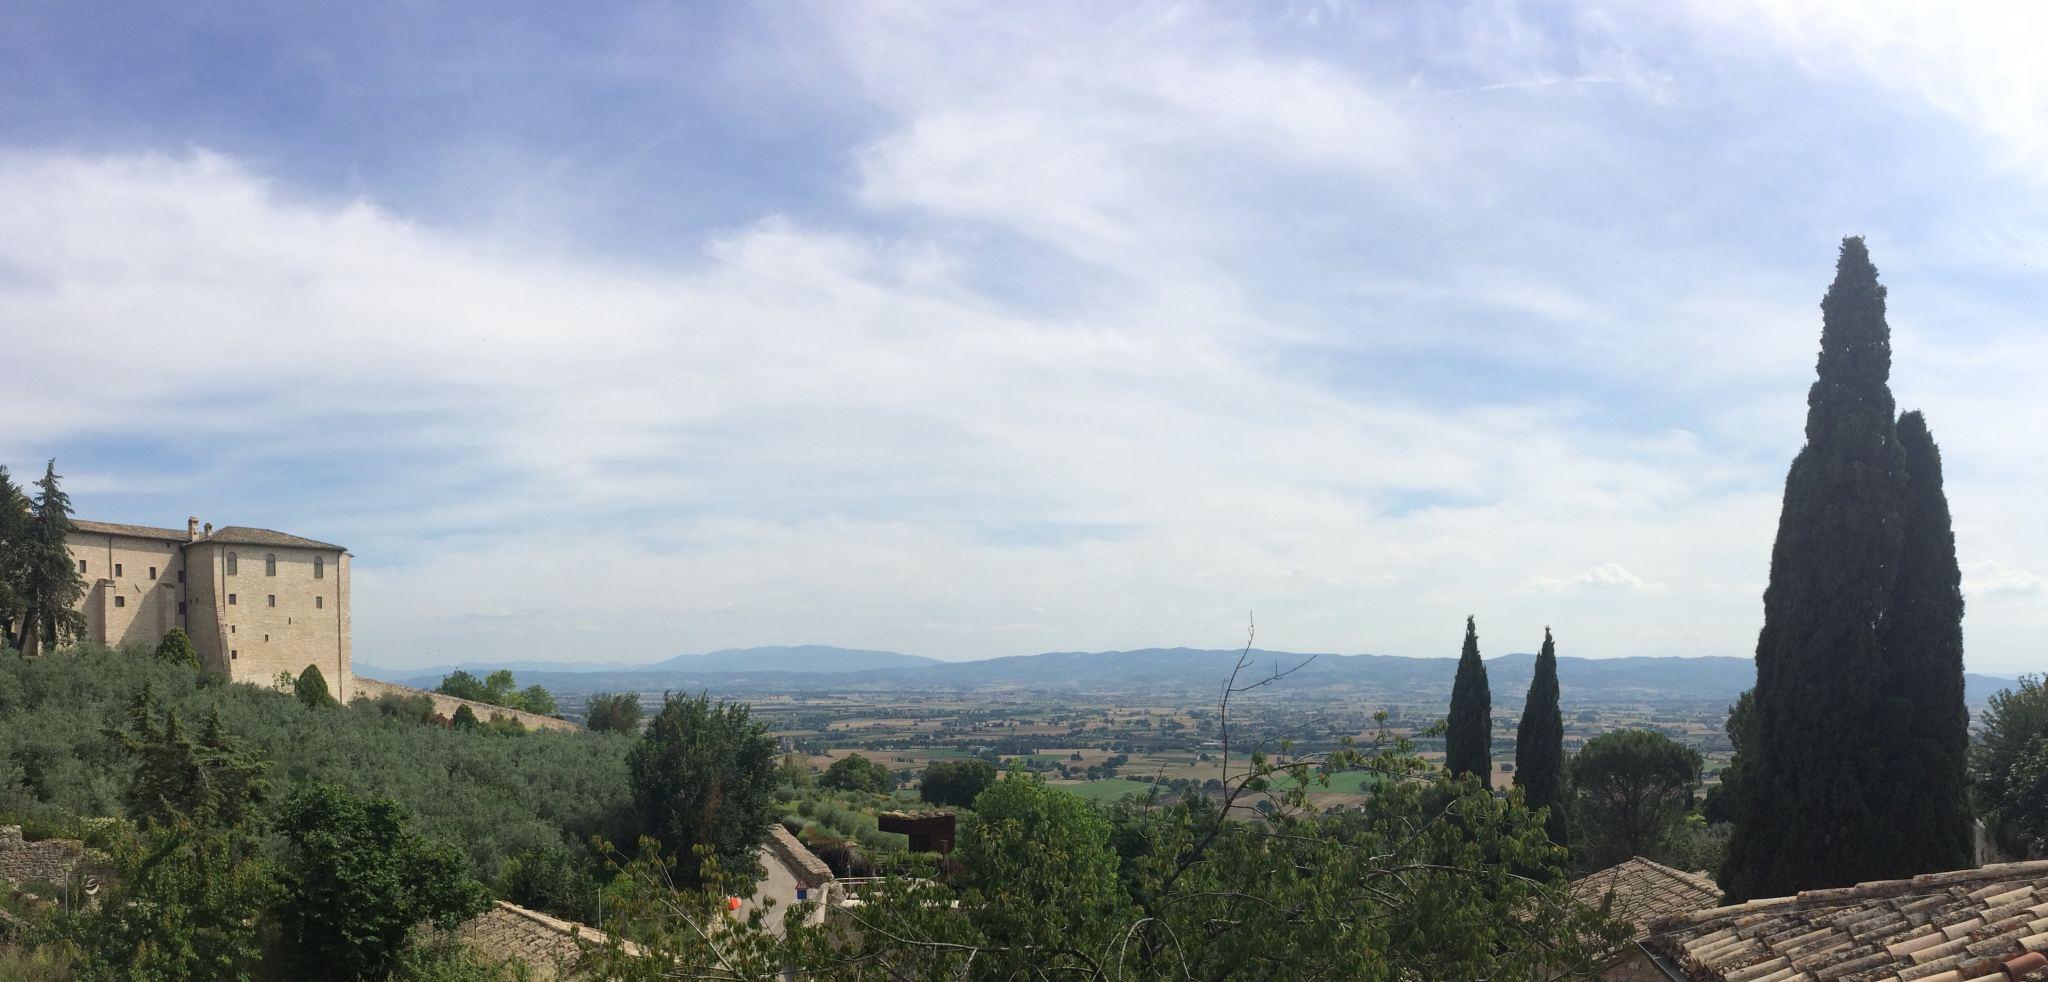 tiber valley